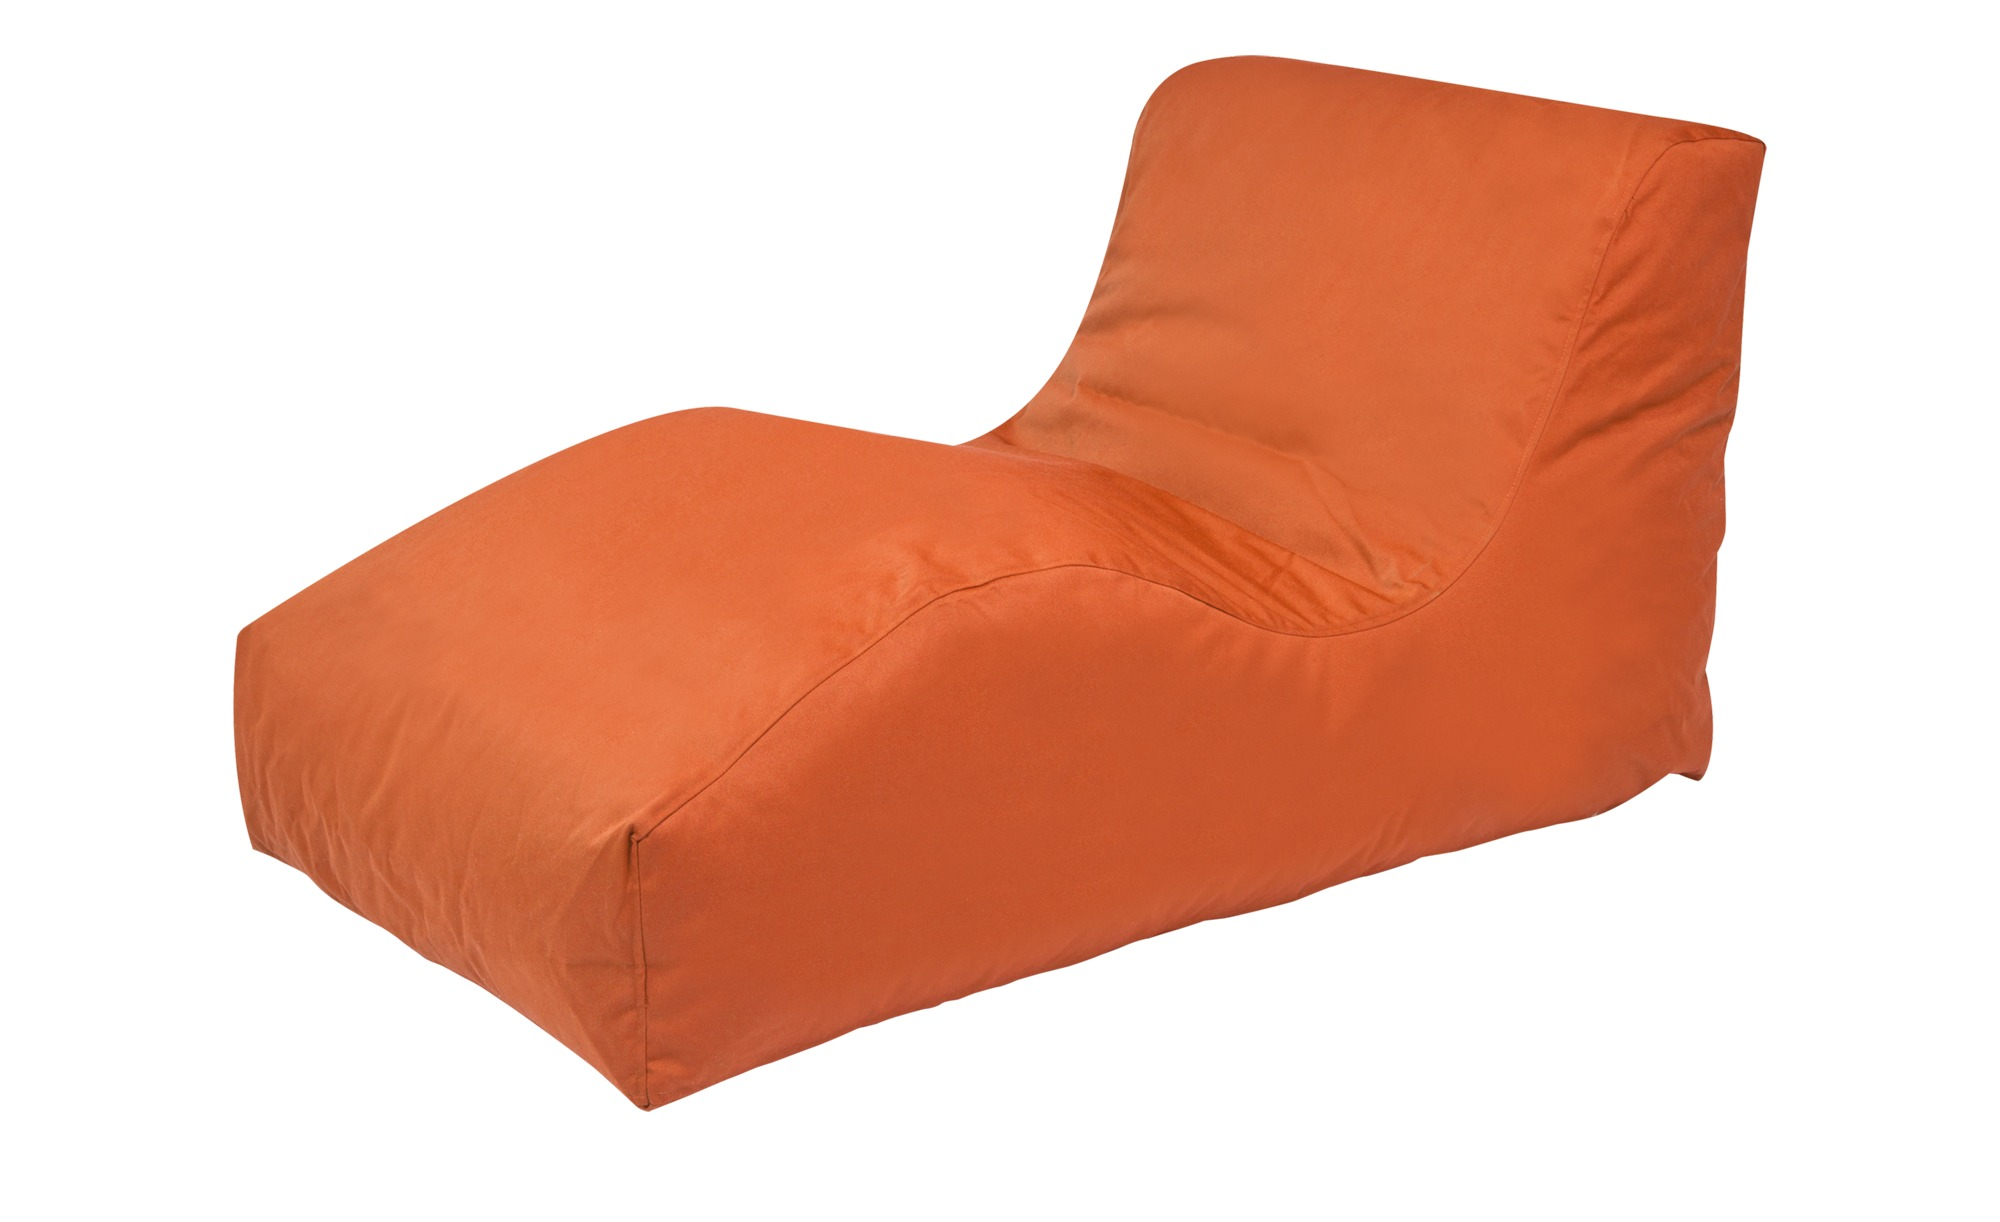 Full Size of Sitzsack Sofa Outbag Wave Plus Orange Mbel Hffner Hay Mags Himolla Schillig Flexform 2 Sitzer Big Günstig Garnitur Online Kaufen U Form Xxl Langes Natura Neu Sofa Sitzsack Sofa